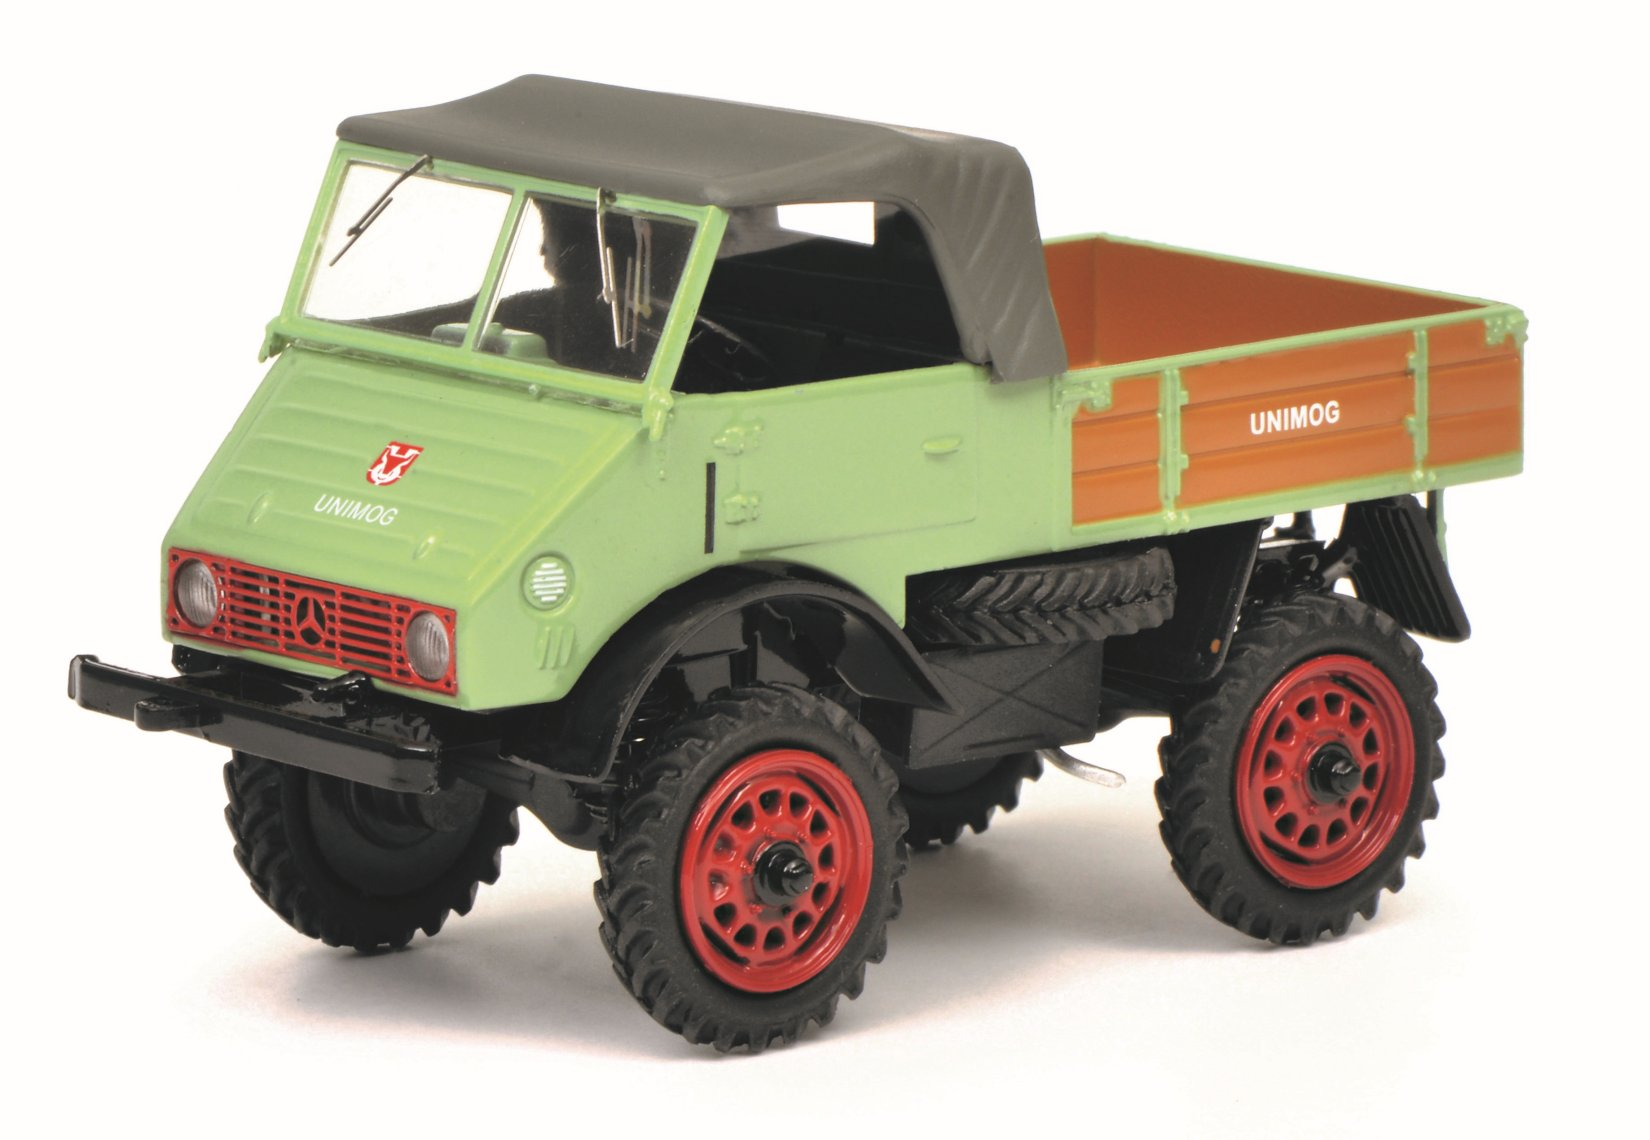 SCHUCO-Modell Unimog 401 - 1:43